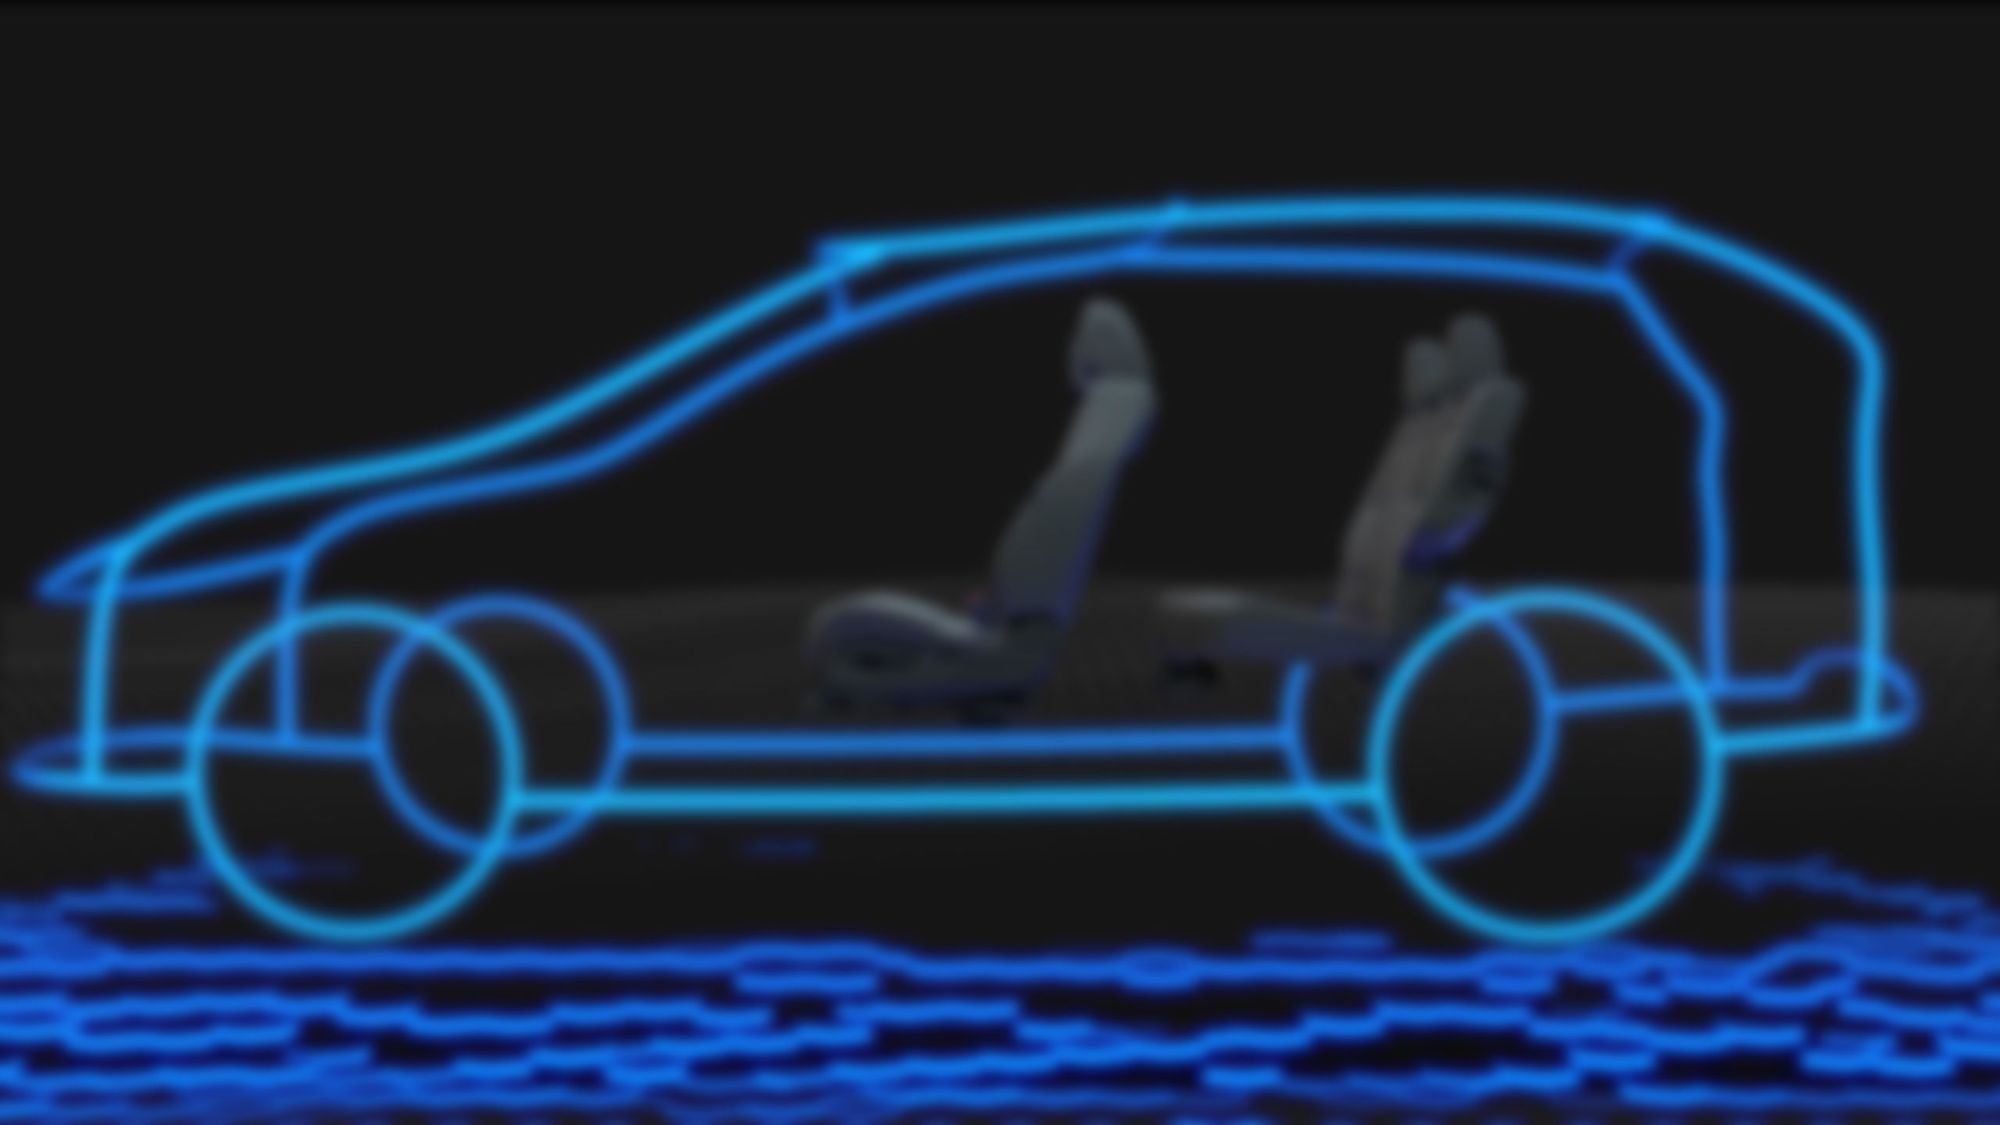 hight resolution of honda cr v hybrid suv wire fream schematic interior blurred